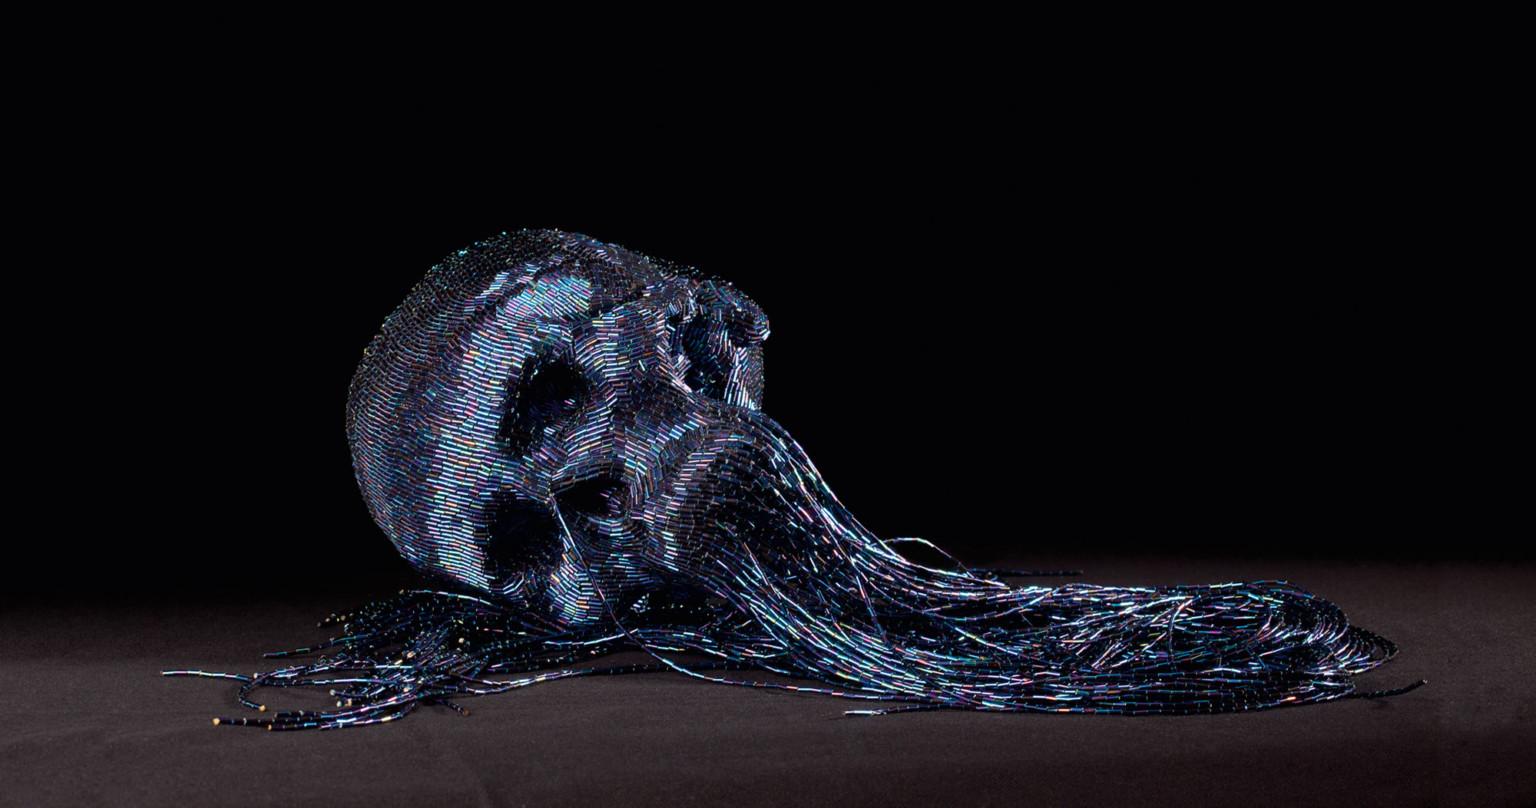 skull-6-768x404_2x.jpg